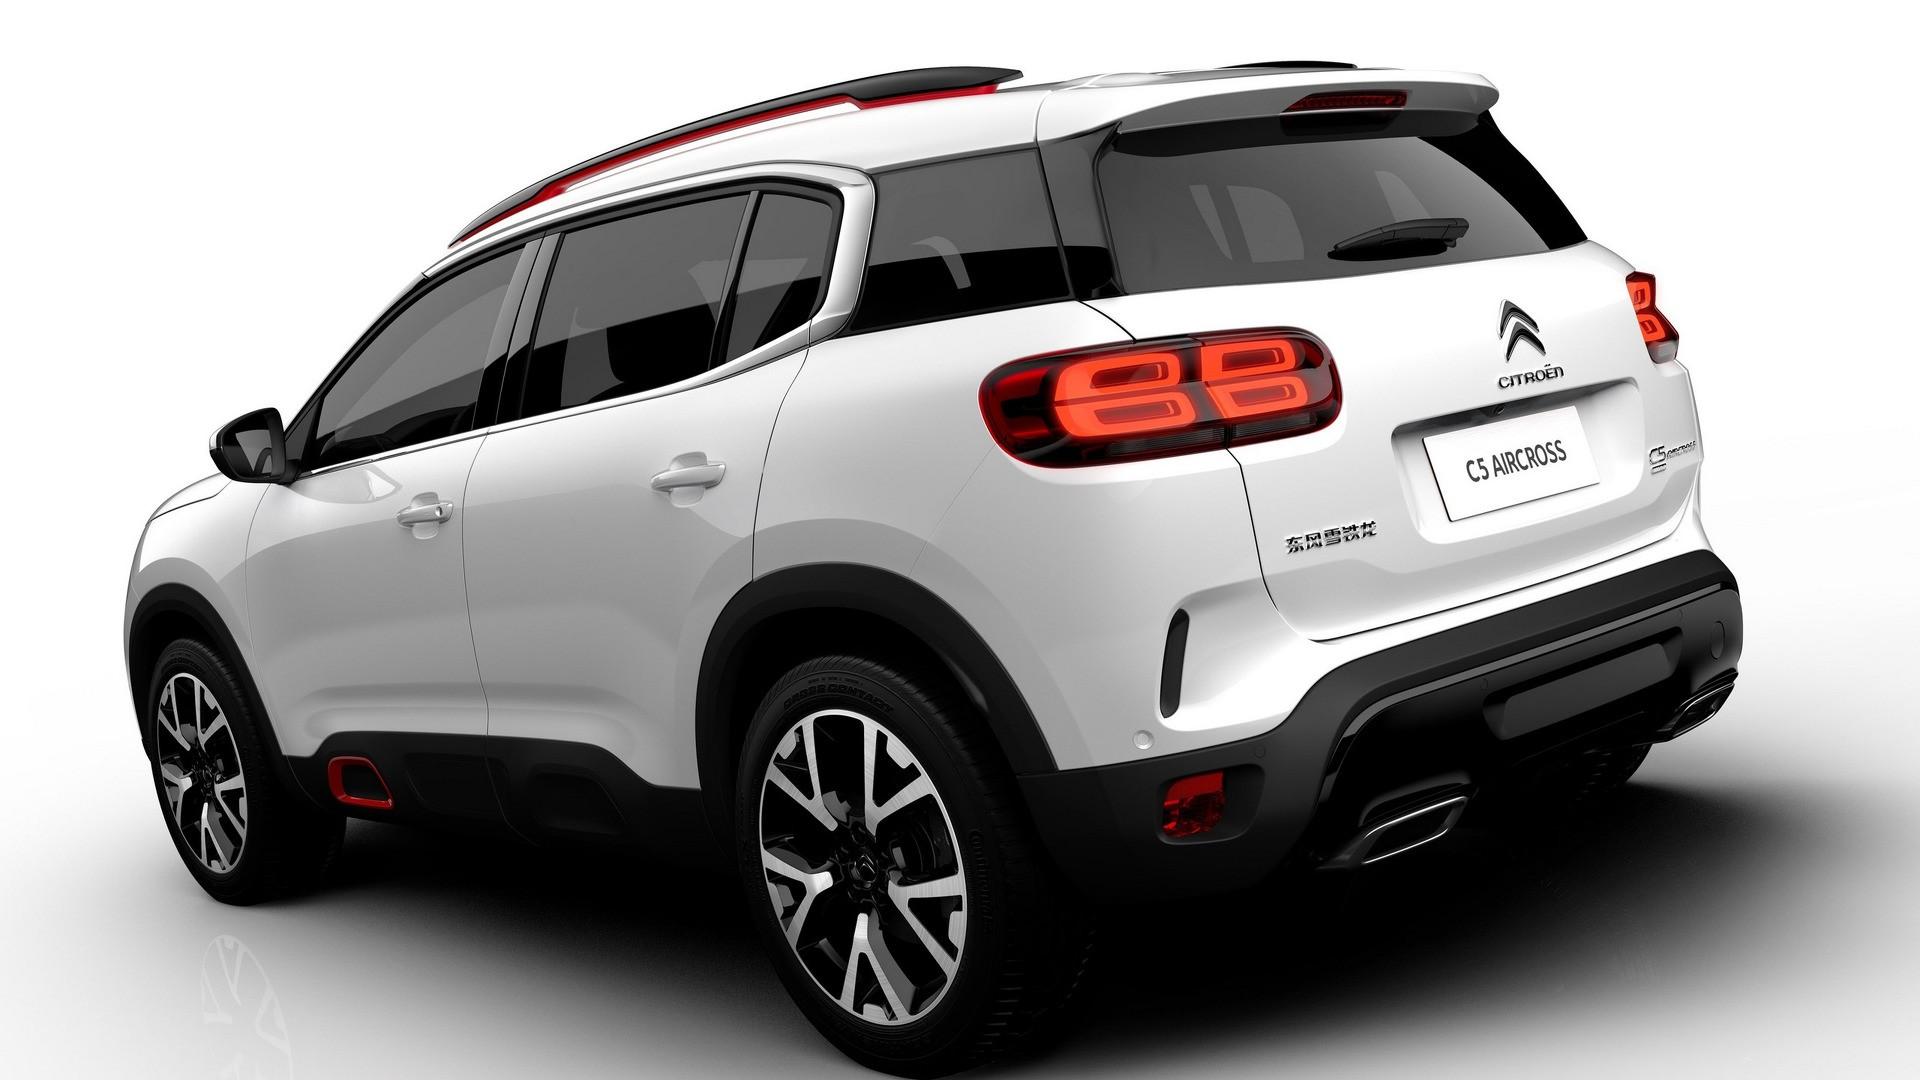 Citroen Hybrid Air >> Citroen C5 Aircross SUV Hybrid Concept Looks Almost Ready For Production - autoevolution